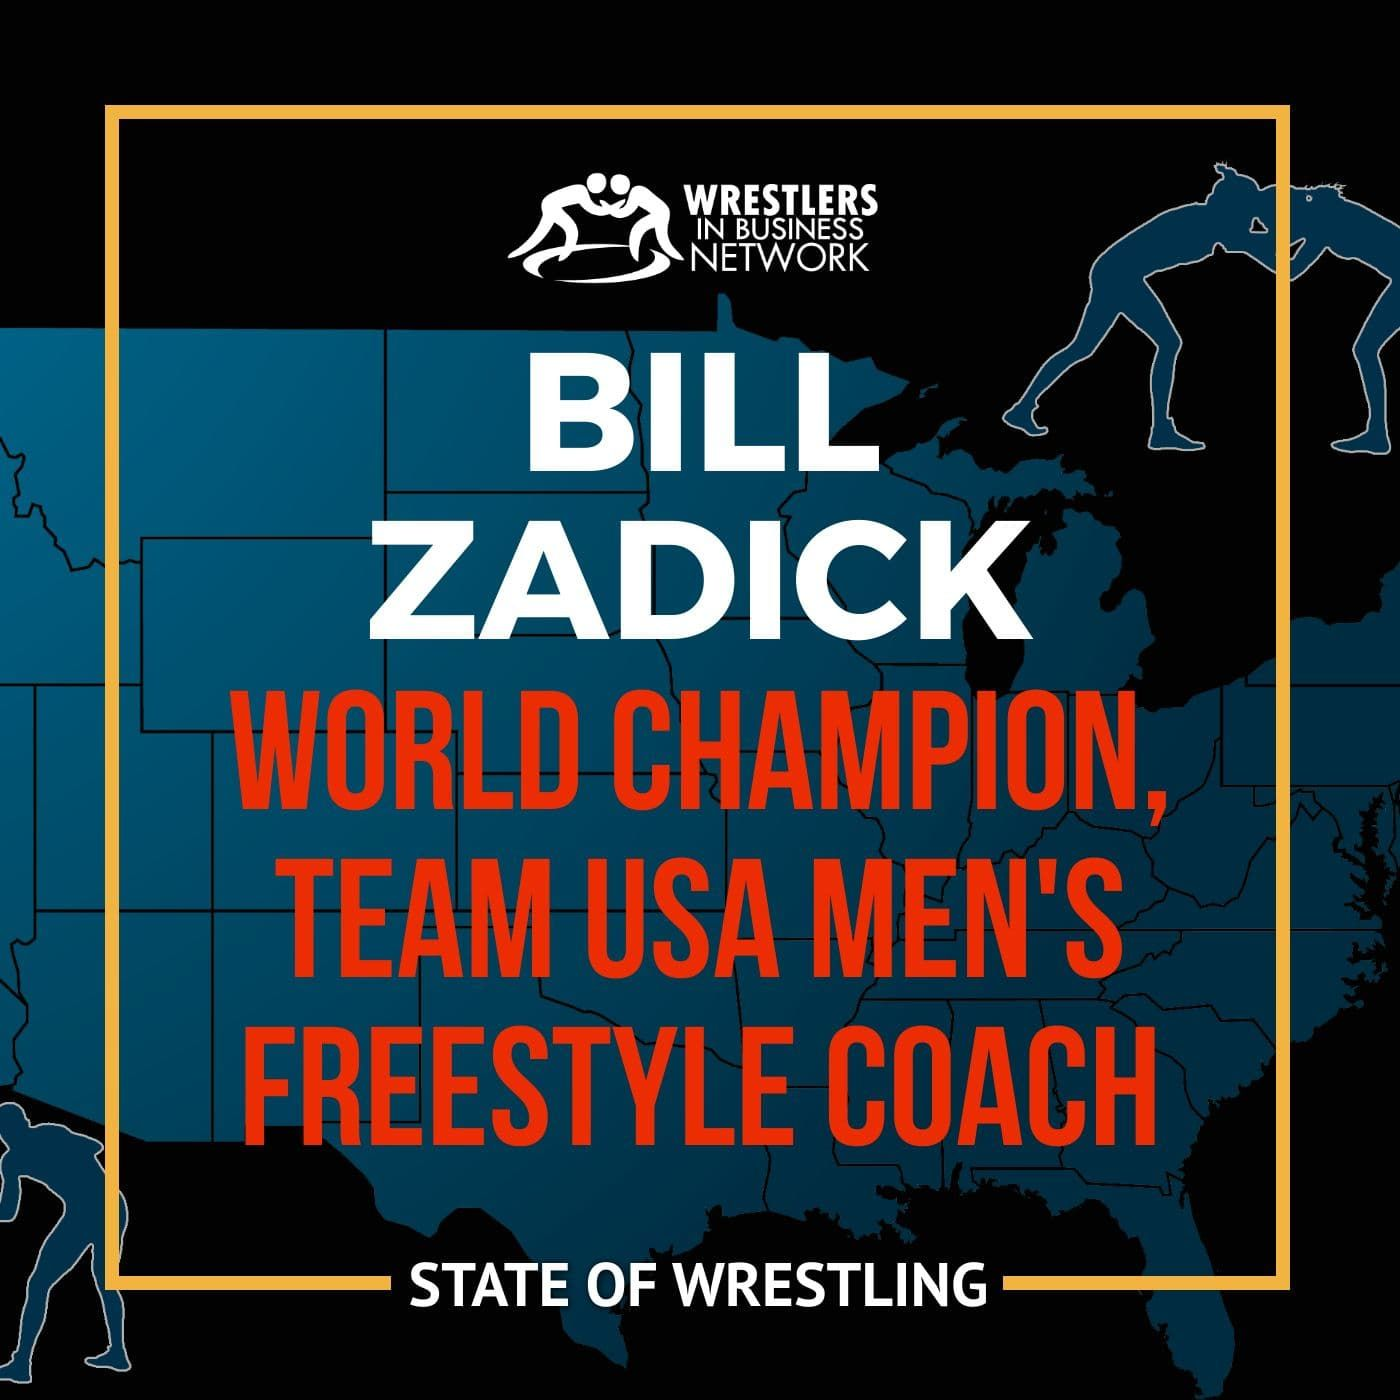 WIBN Philly Webinar: Bill Zadick, 2006 World Champion and Team USA men's freestyle coach